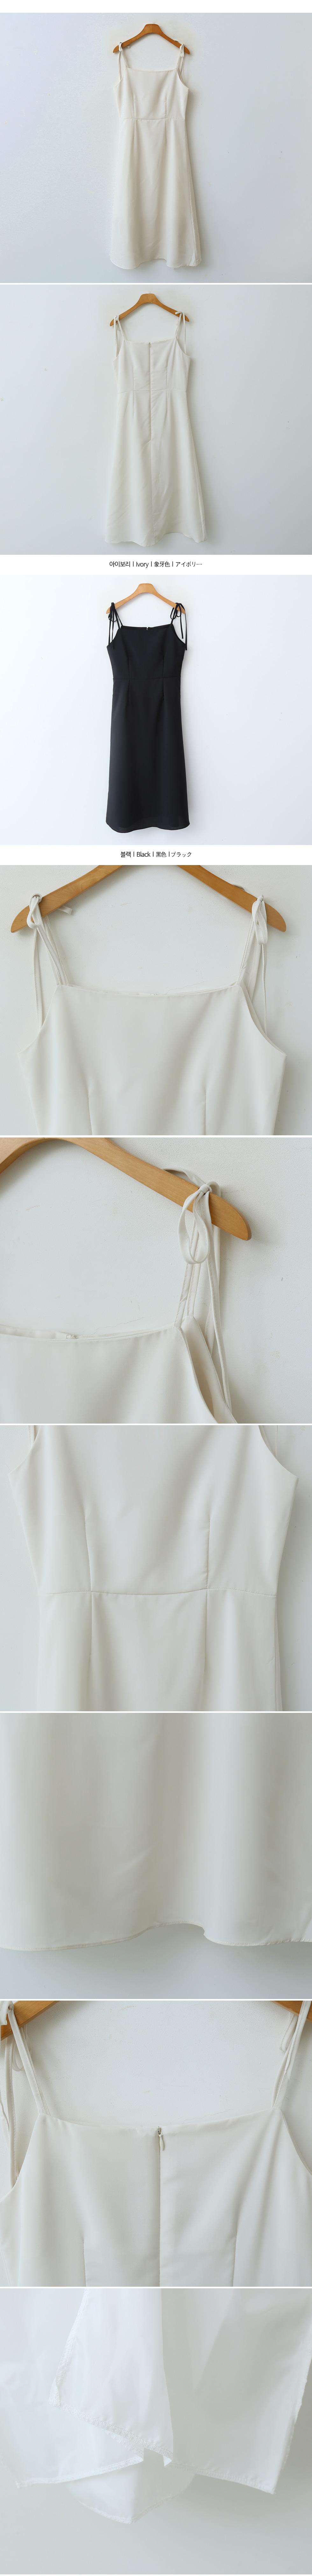 Melodart Sleeveless Dress